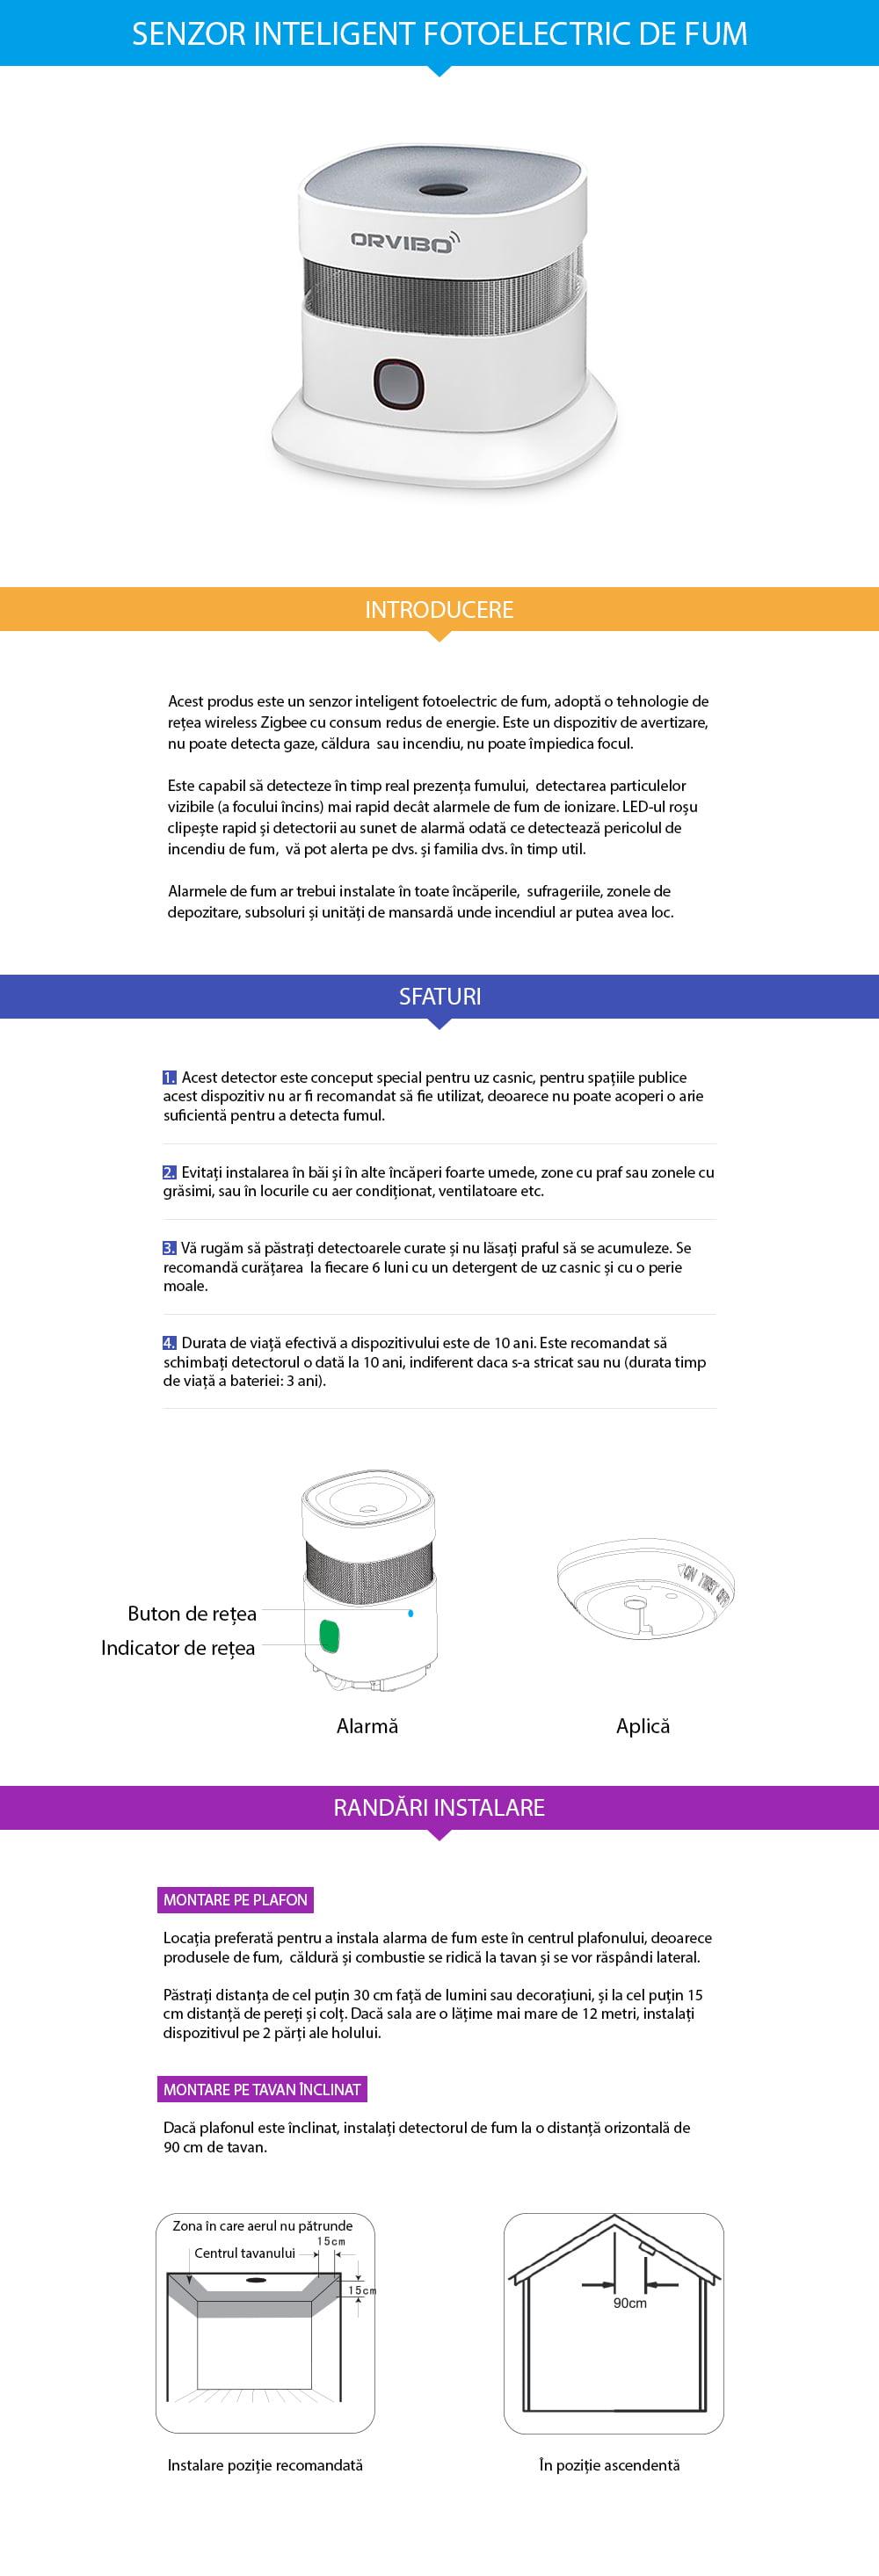 Senzor inteligent de fum ORVIBO 3